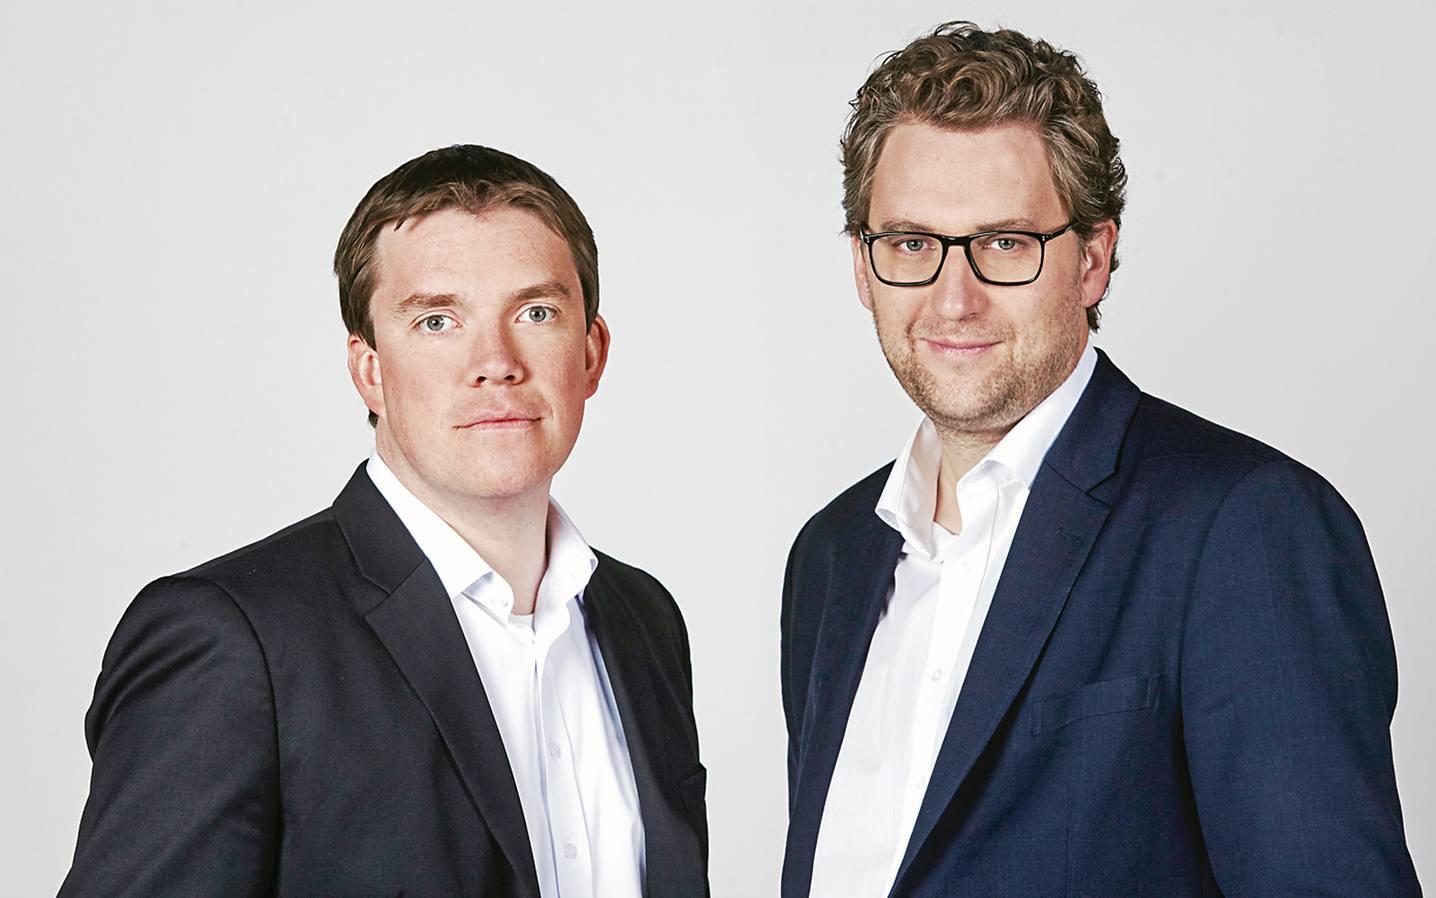 Audibene Founders, Marco Vietor & Paul Crusius